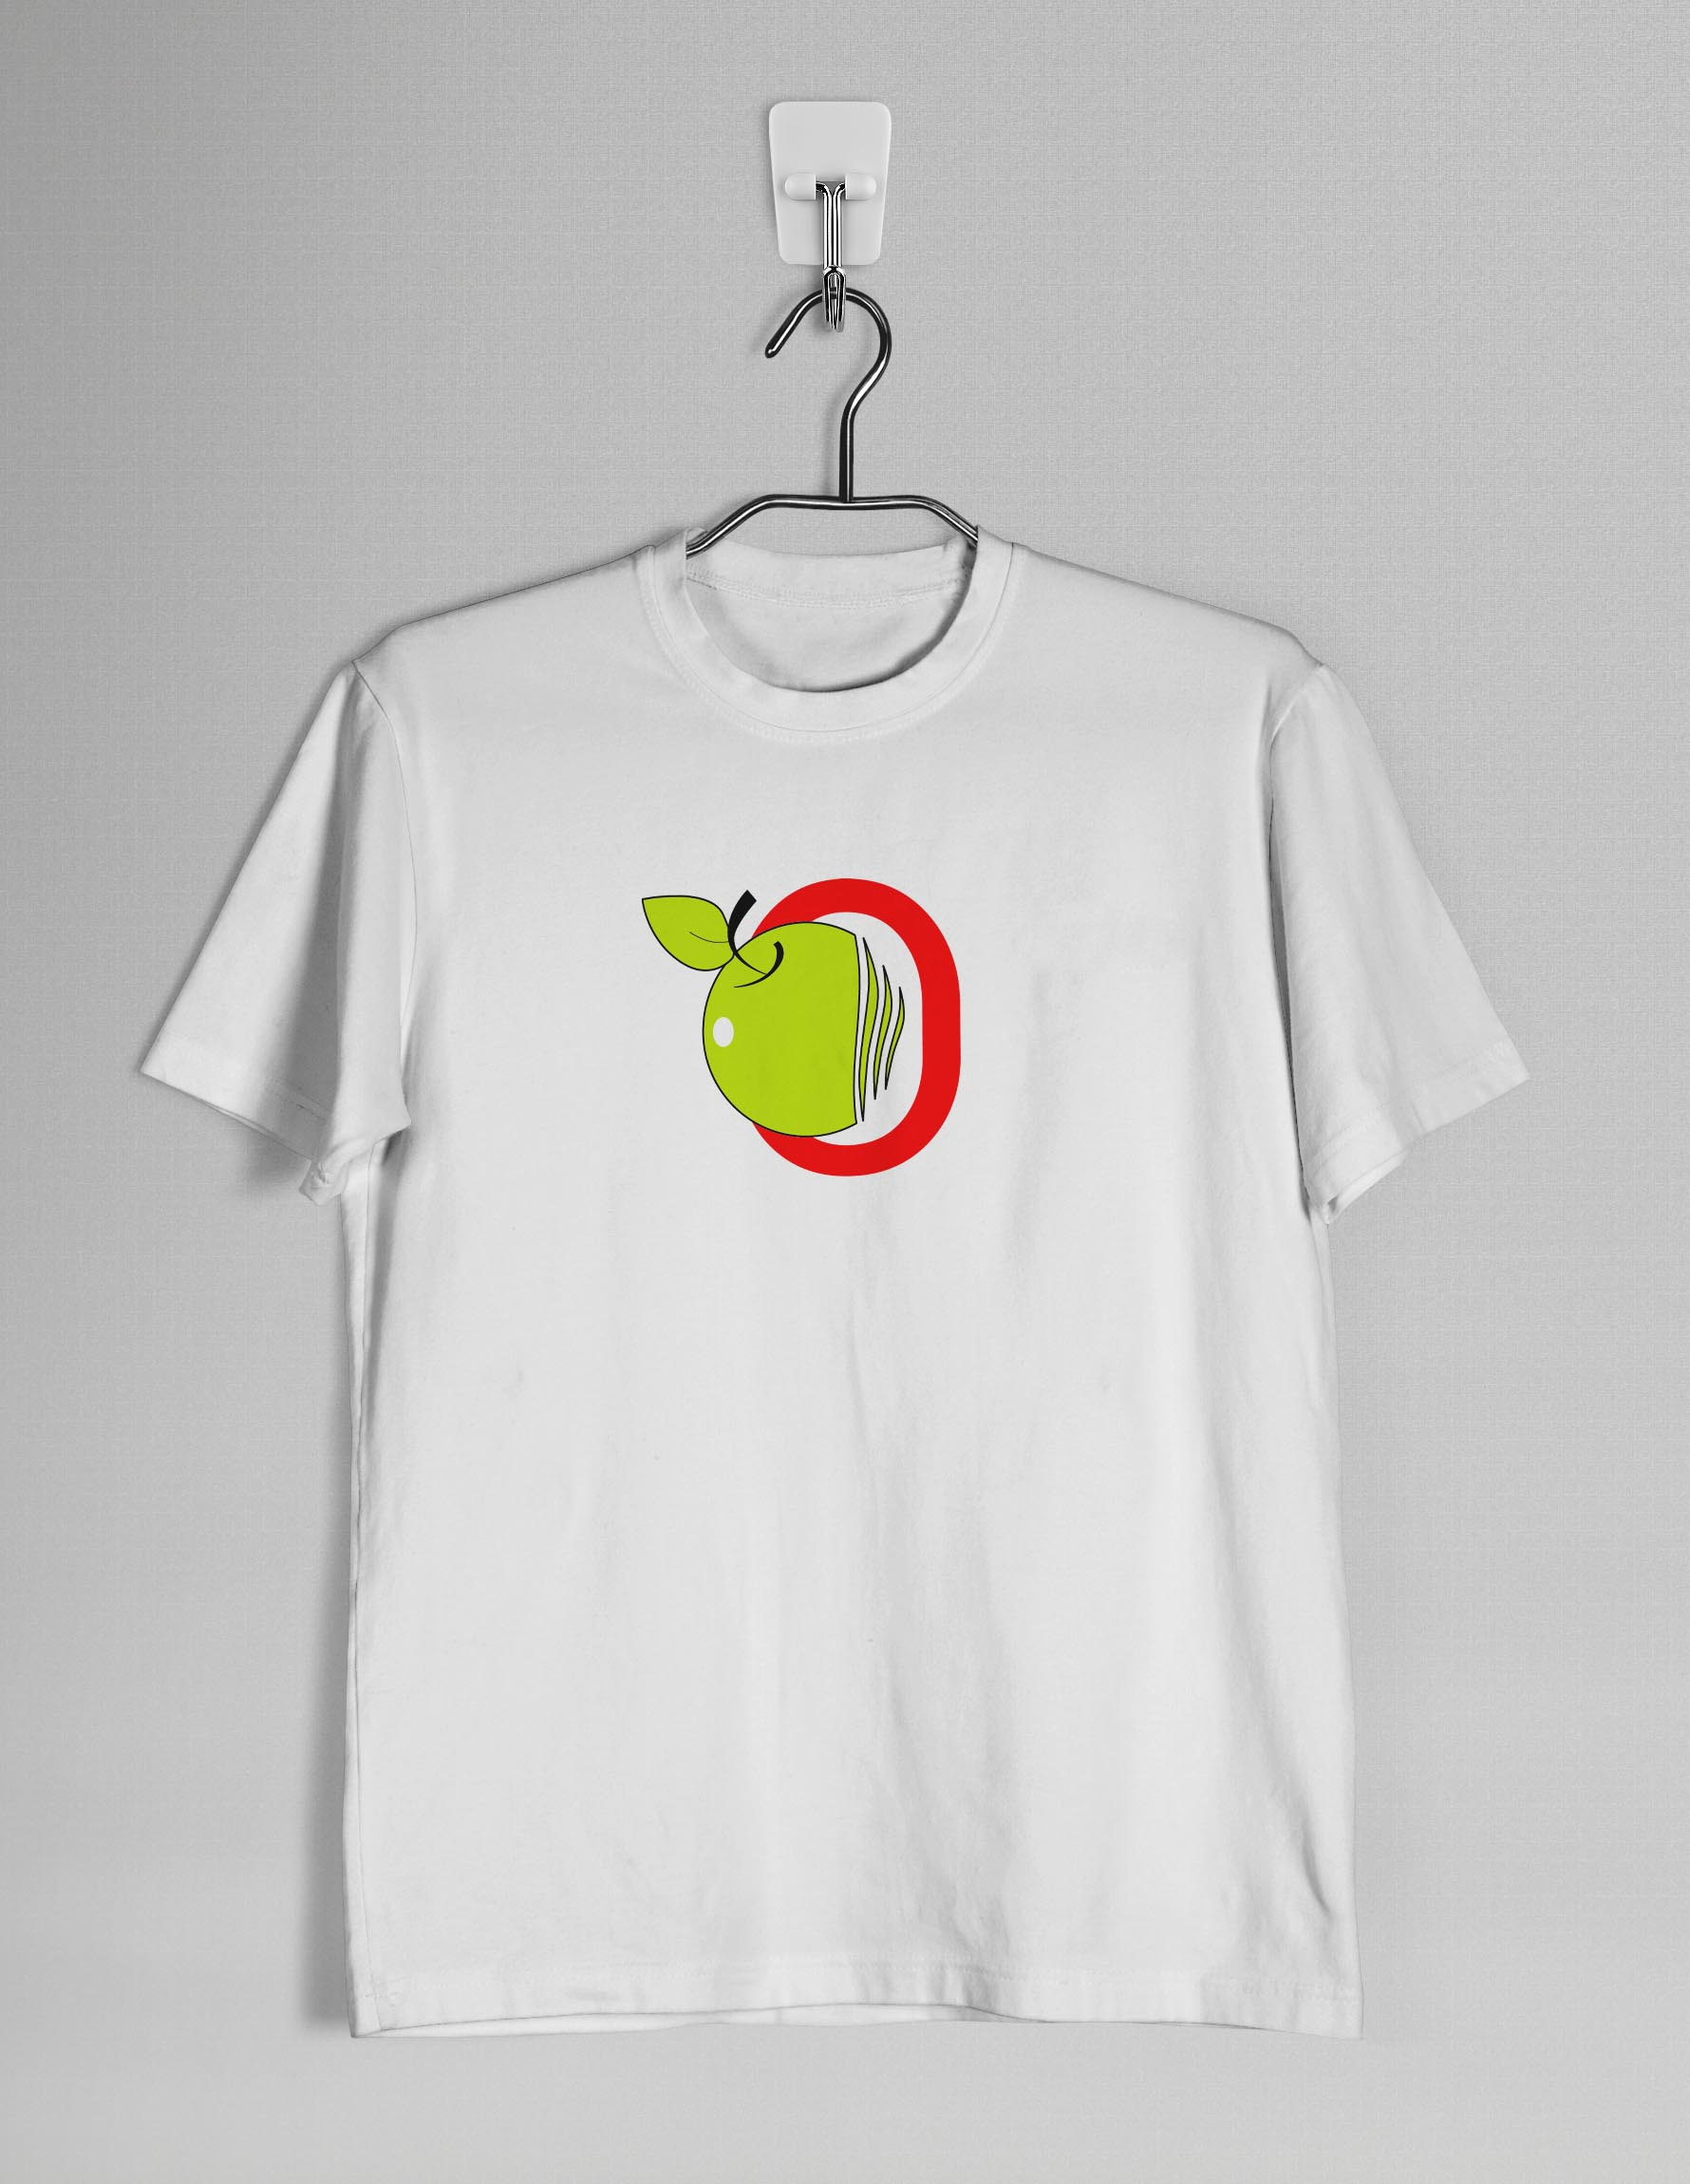 Логотип. Интернет - магазин по доставке продуктов питания. фото f_7915ad88edf2c115.jpg